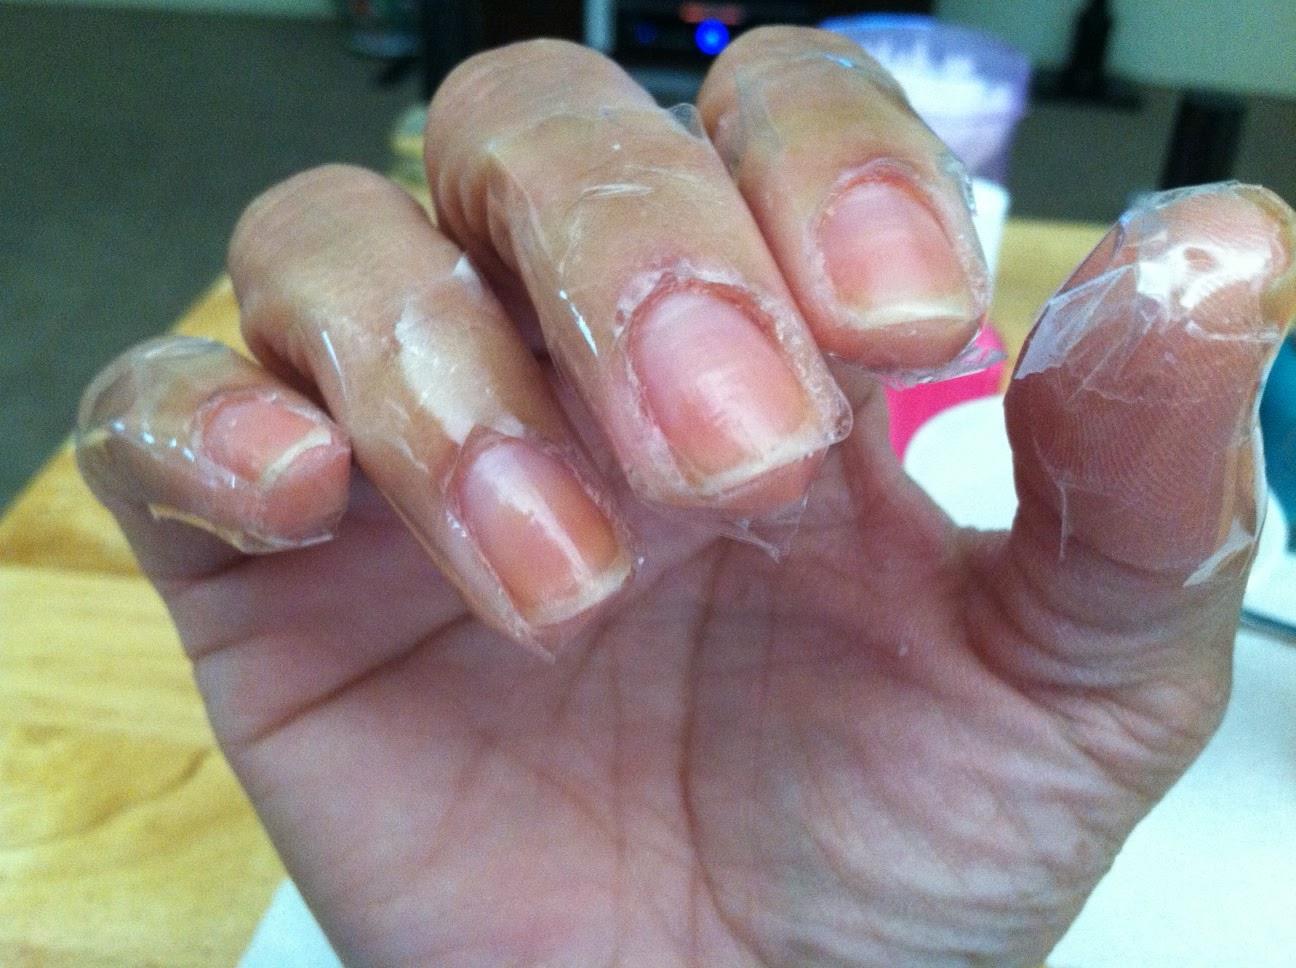 wan life to live: nail art FAIL